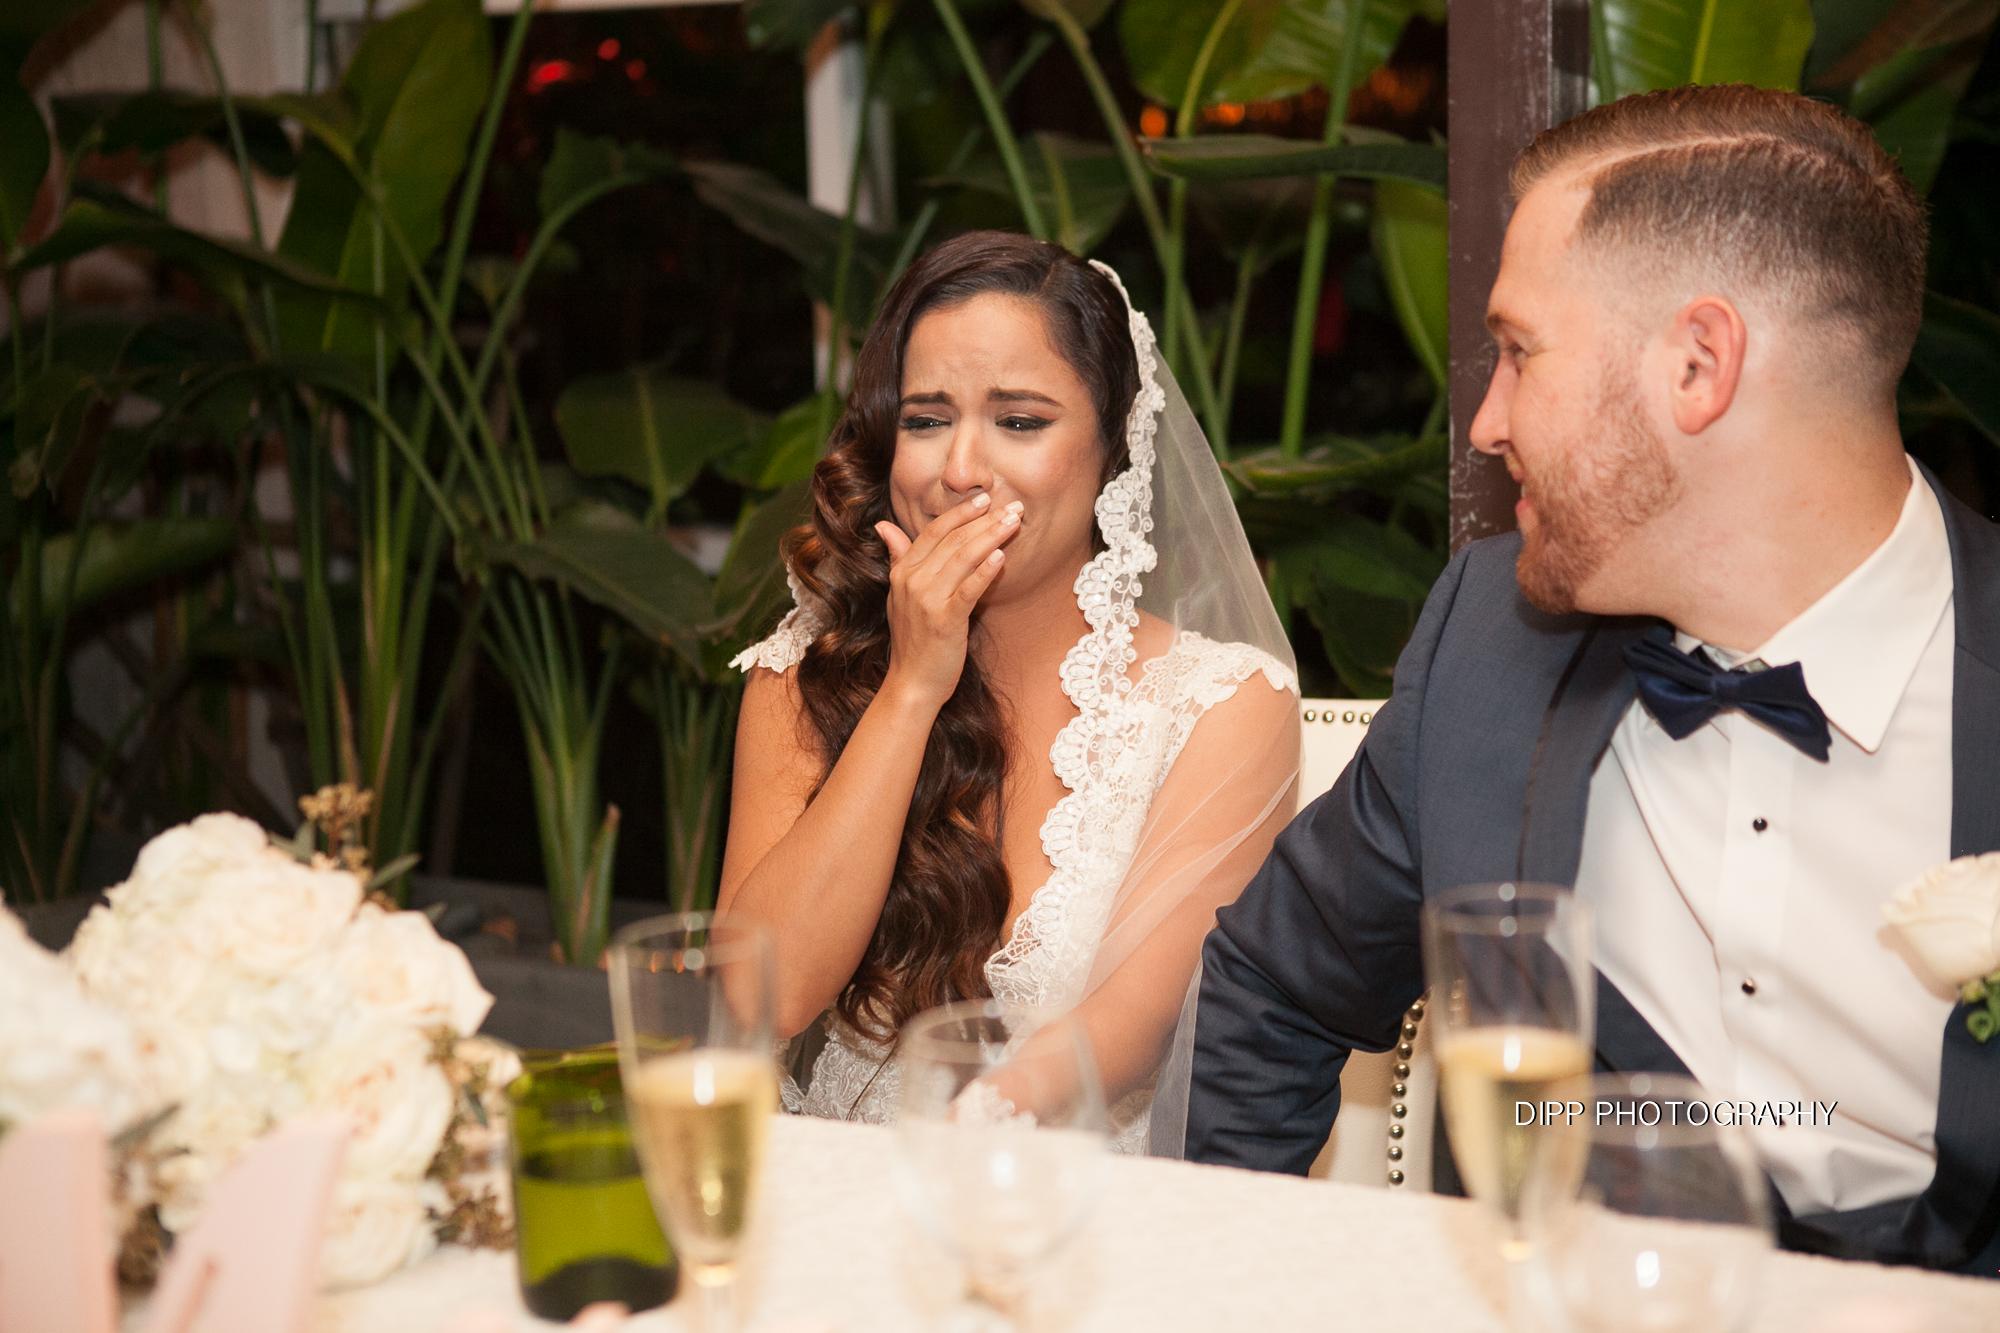 Dipp_2016 EDITED Melissa & Avilio Wedding-520